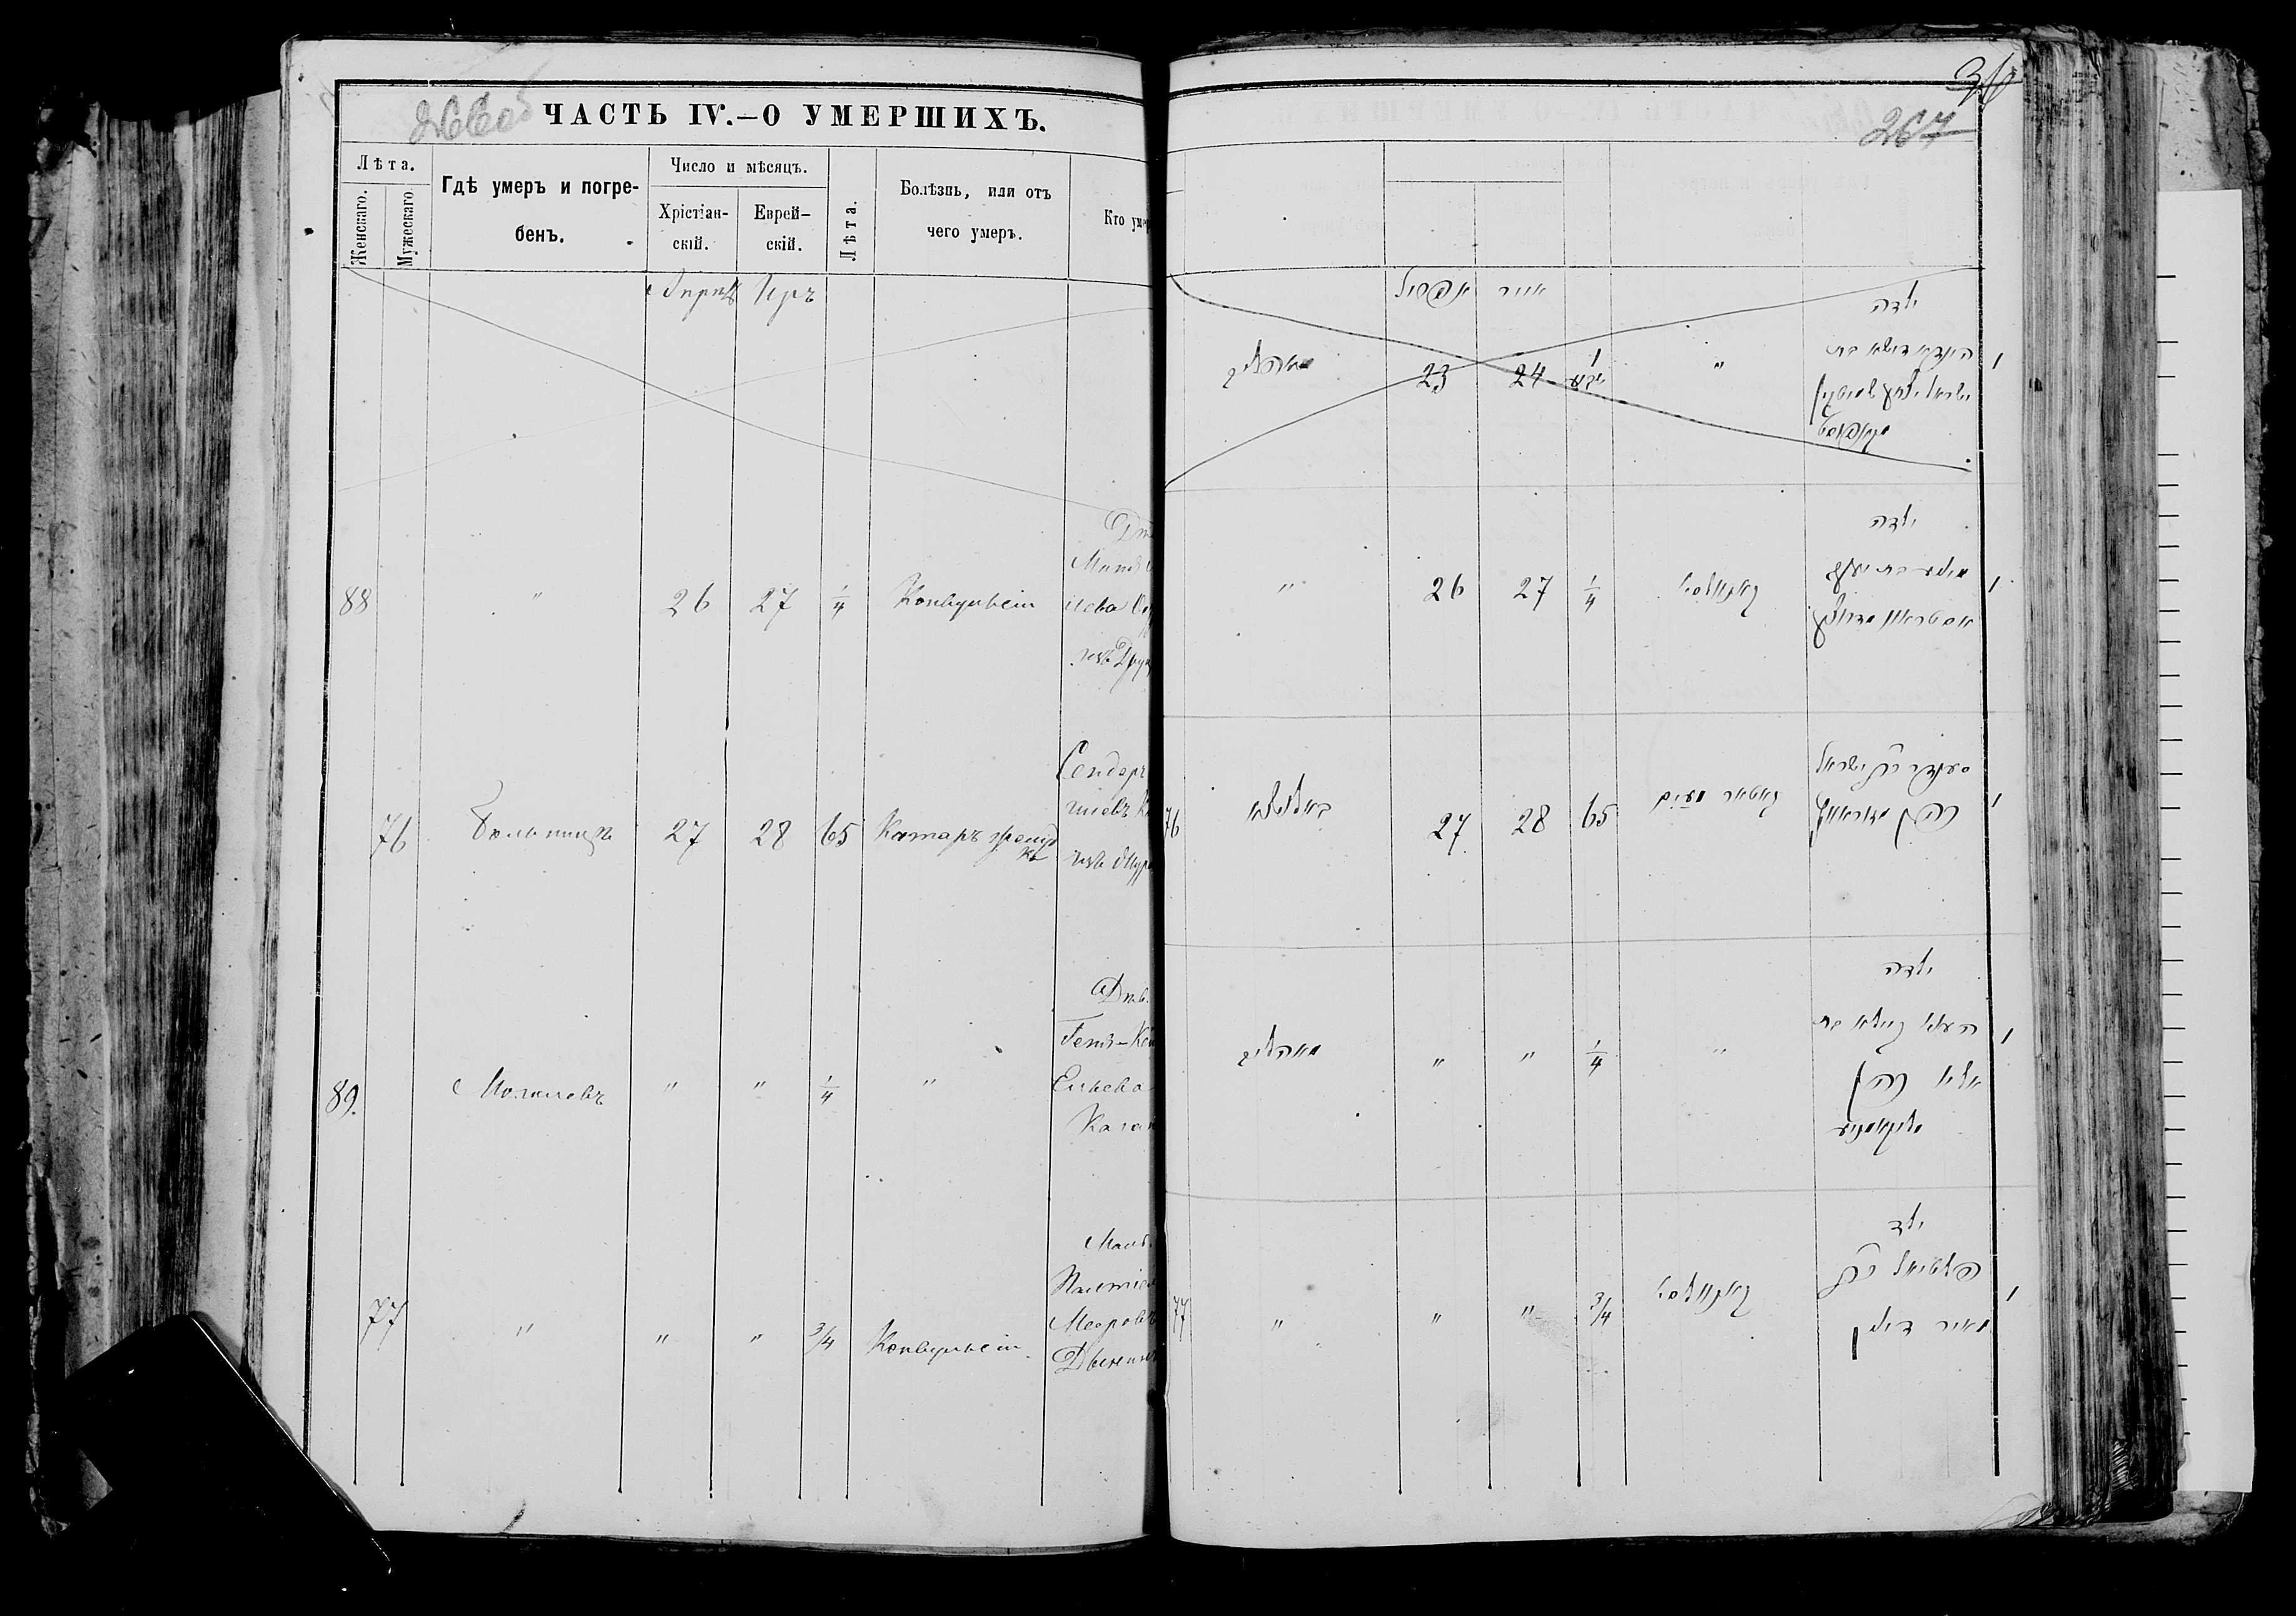 Минья Янкелевна Острова ум. 26 апреля 1880, запись 88, пленка 006677482, снимок 335